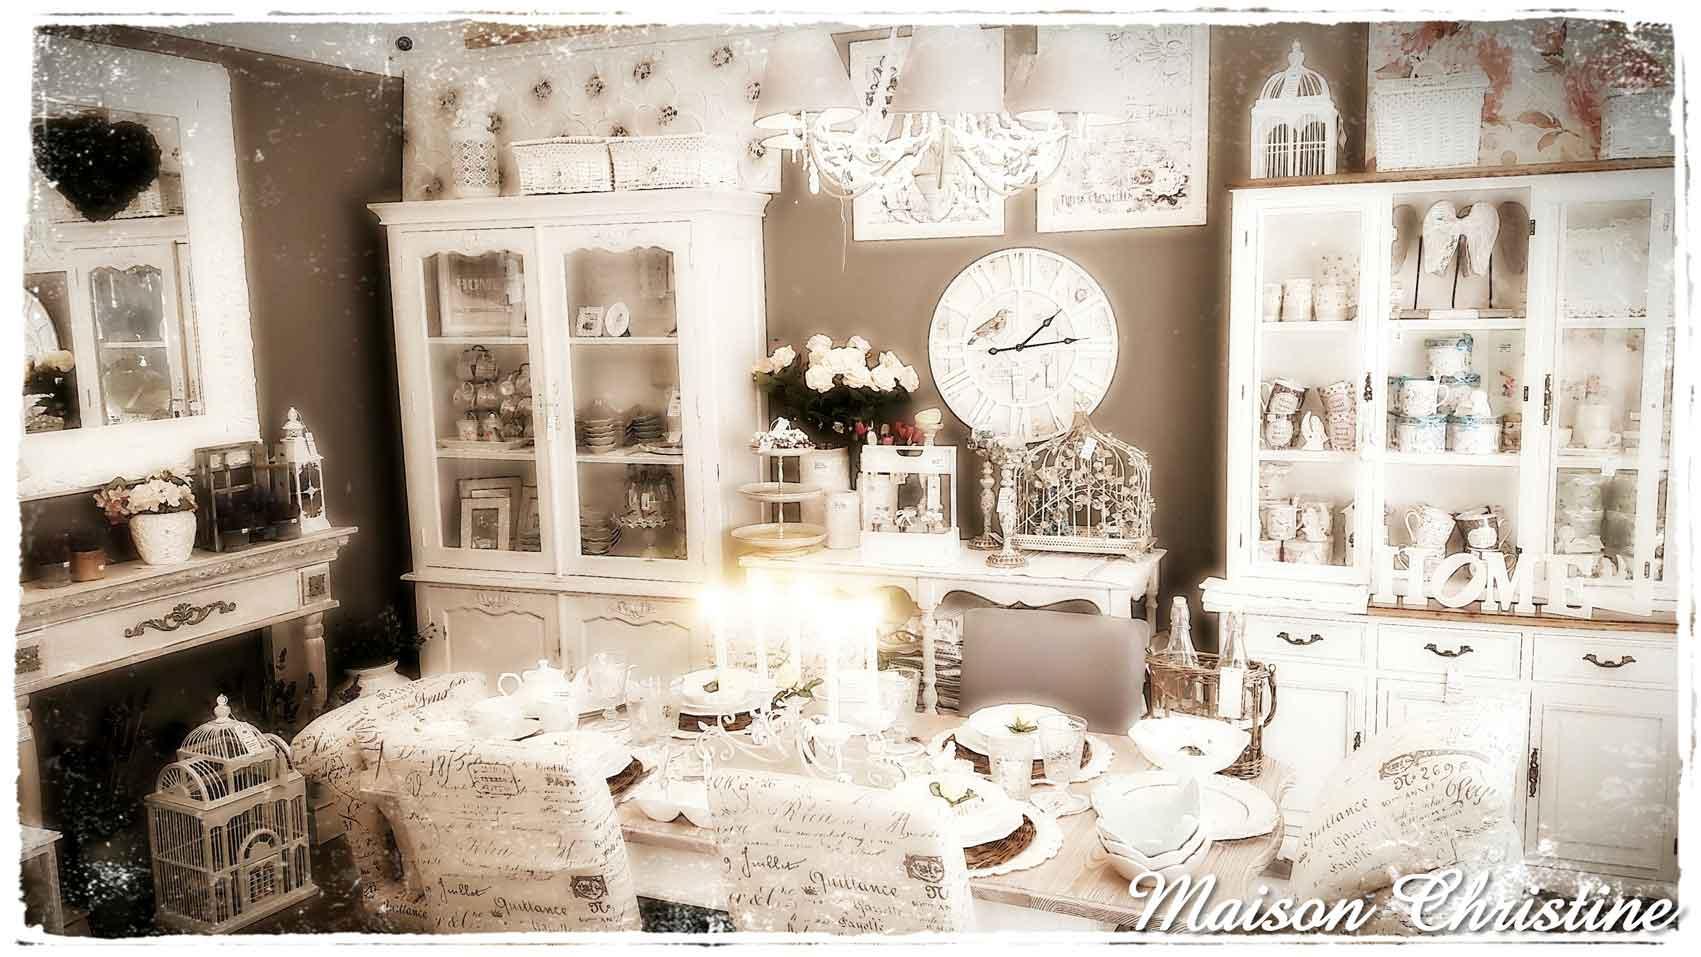 Arredamento shabby chic monza maison christine for Maison arredamento